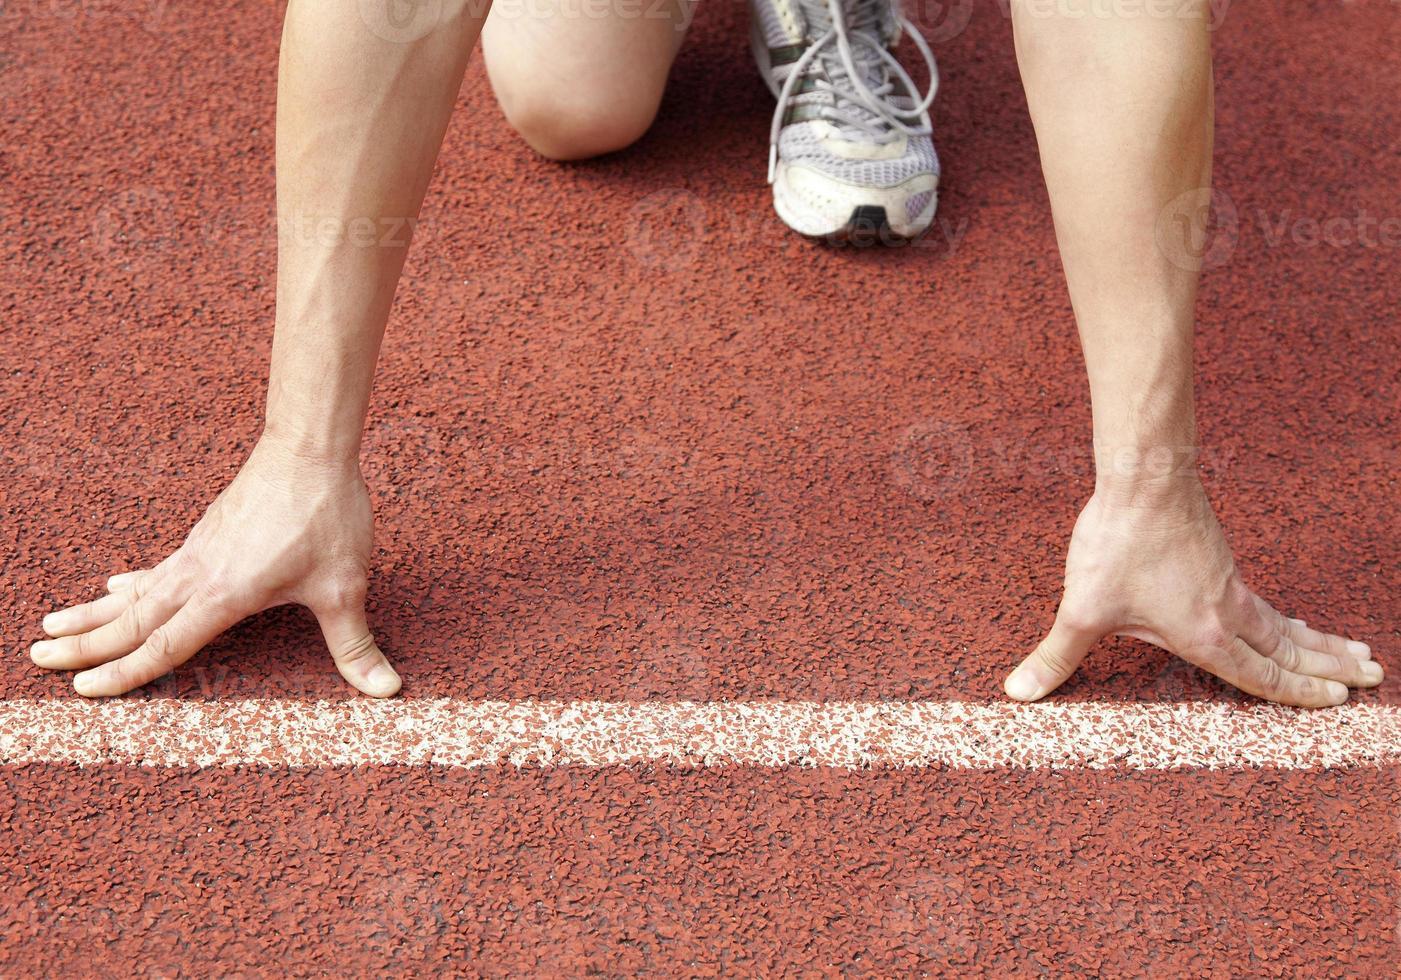 athlete at the start line of the stadium photo